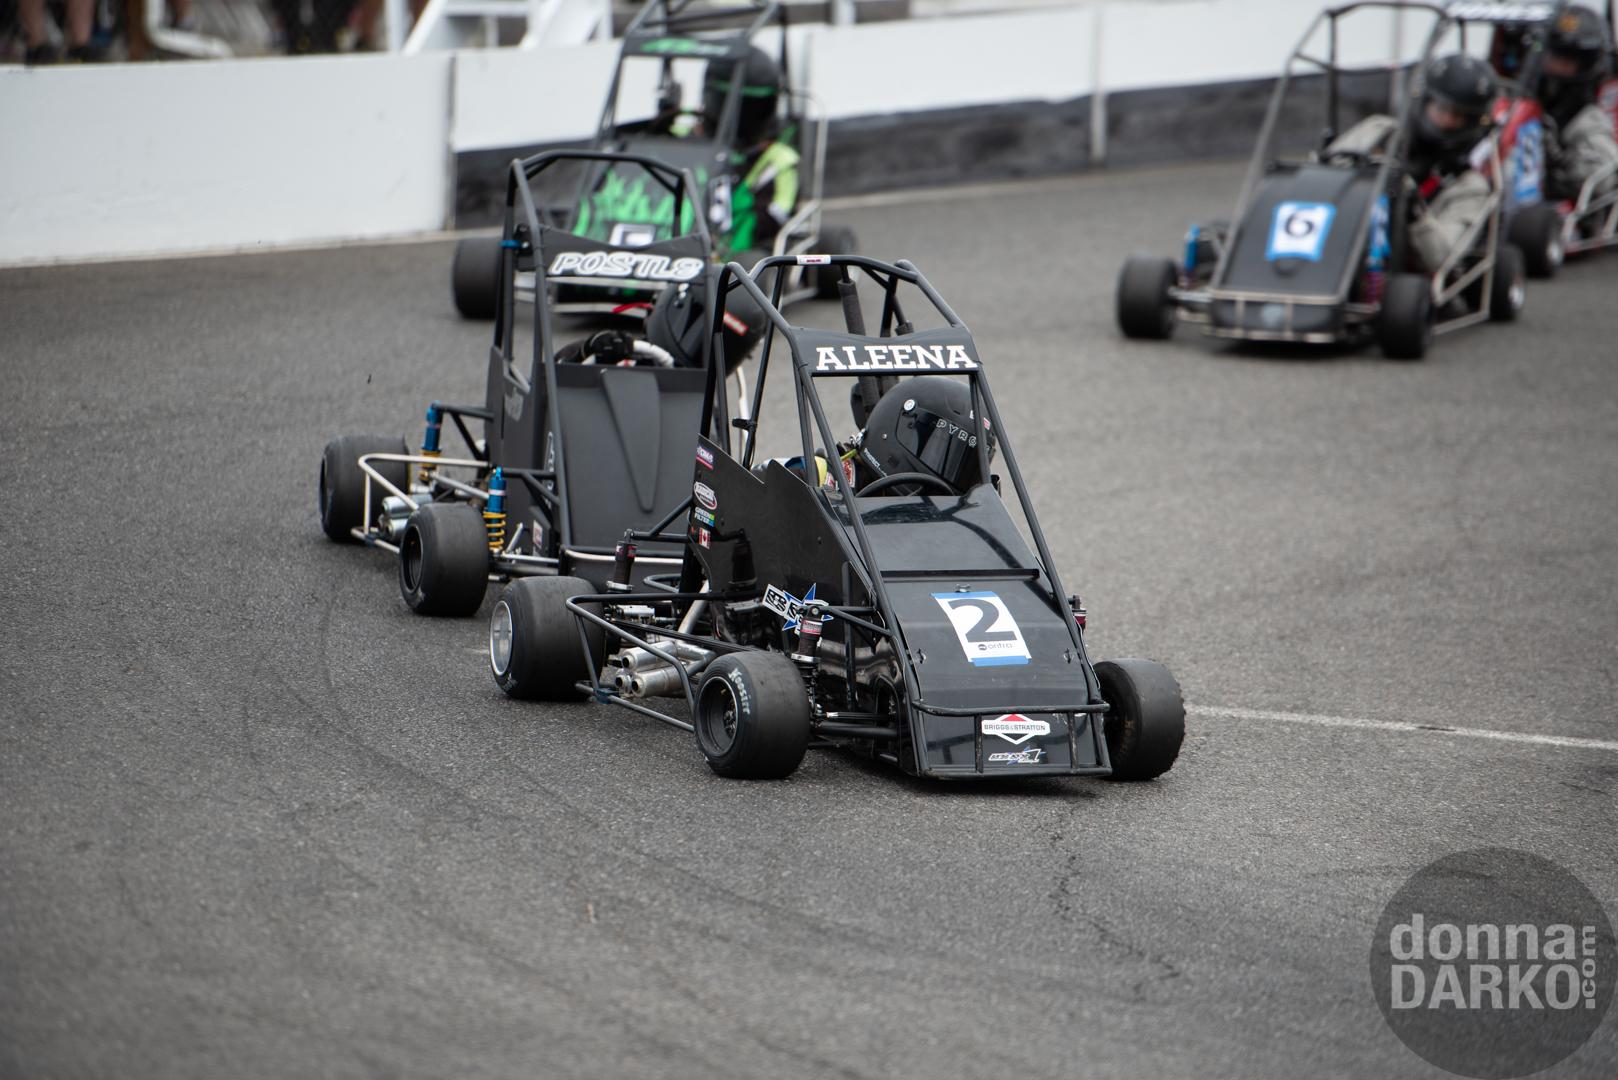 QWMA (Racing) 8-11-2019 DSC_6620.jpg